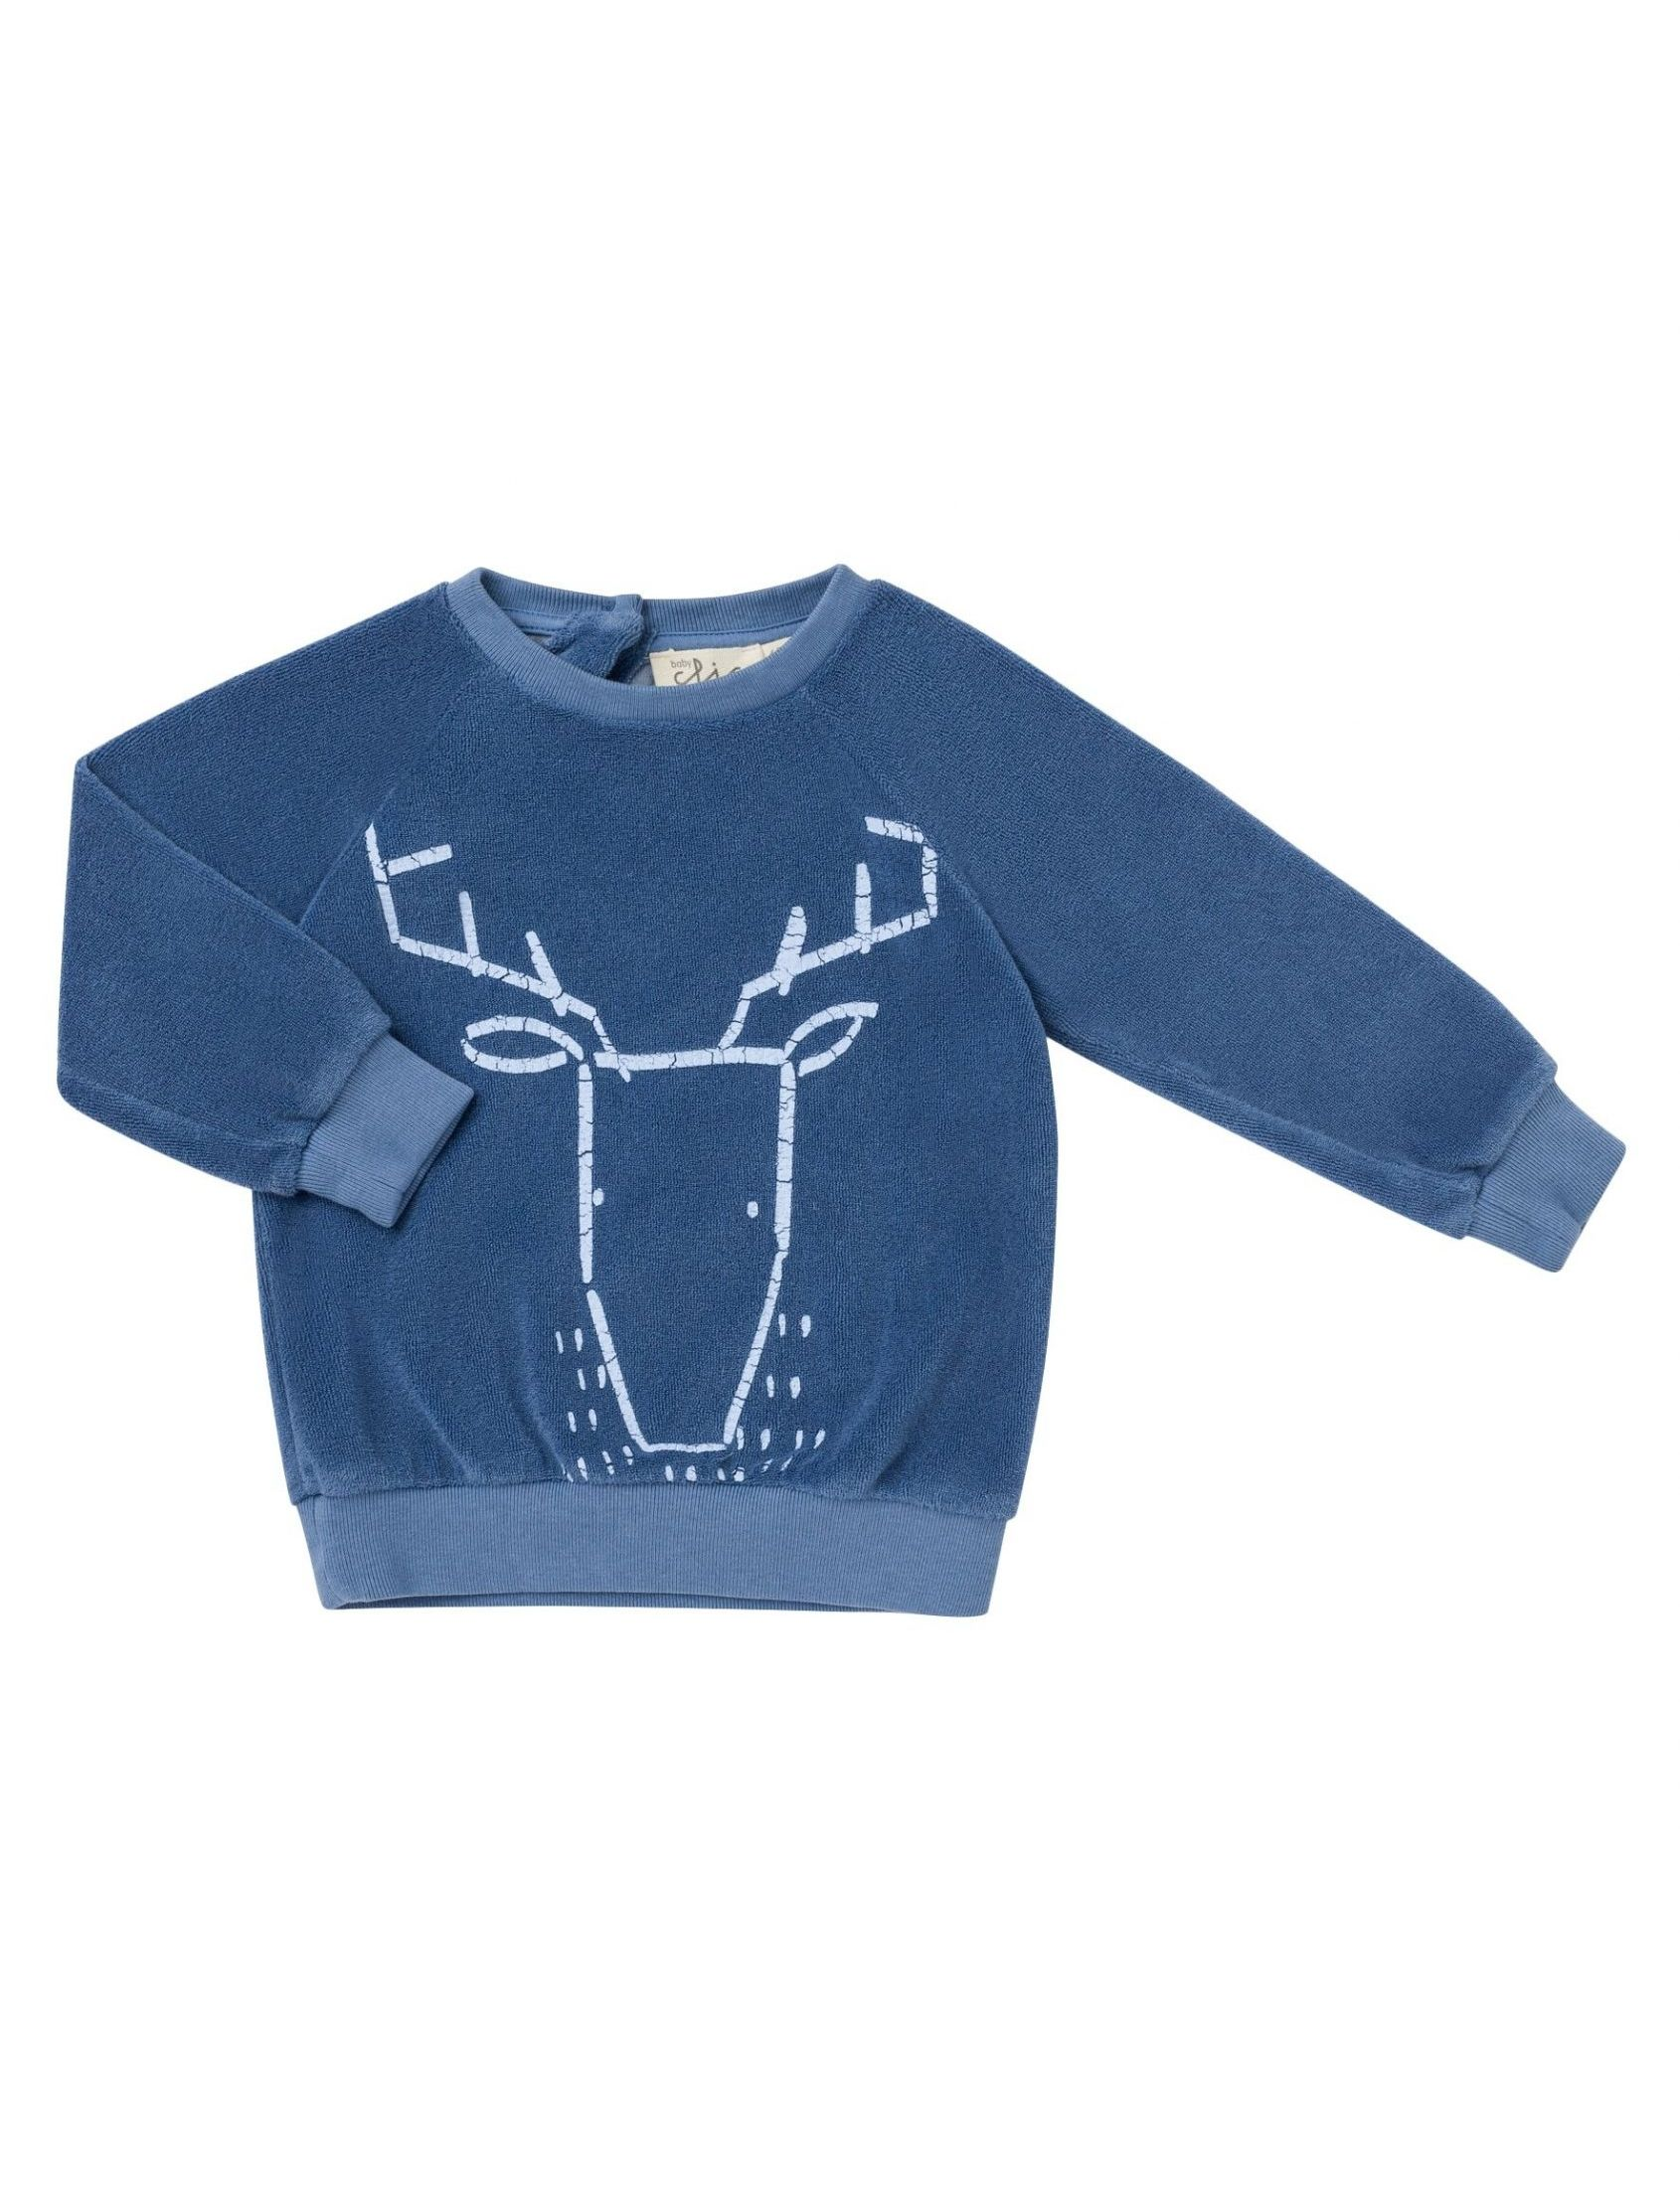 Jersey Rudolf Baby Clic azul_mamalua_01